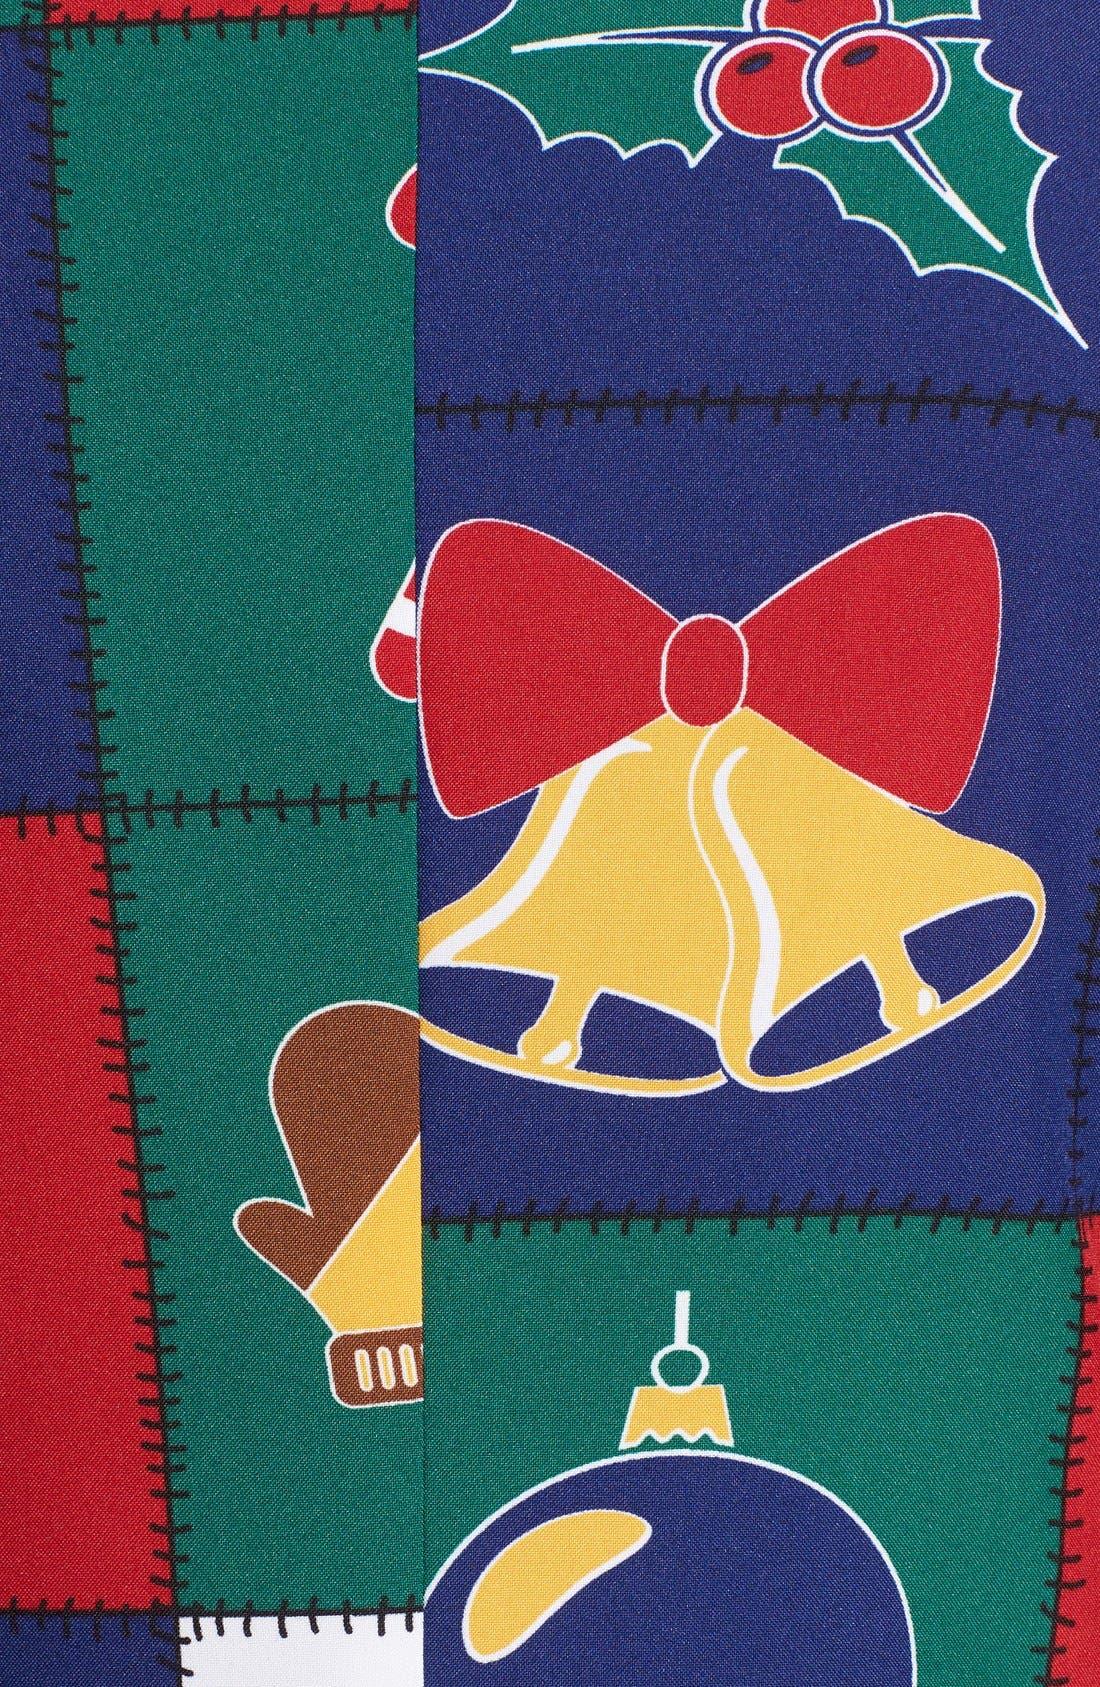 'Quilty Pleasure' Holiday Suit & Tie,                             Alternate thumbnail 4, color,                             300